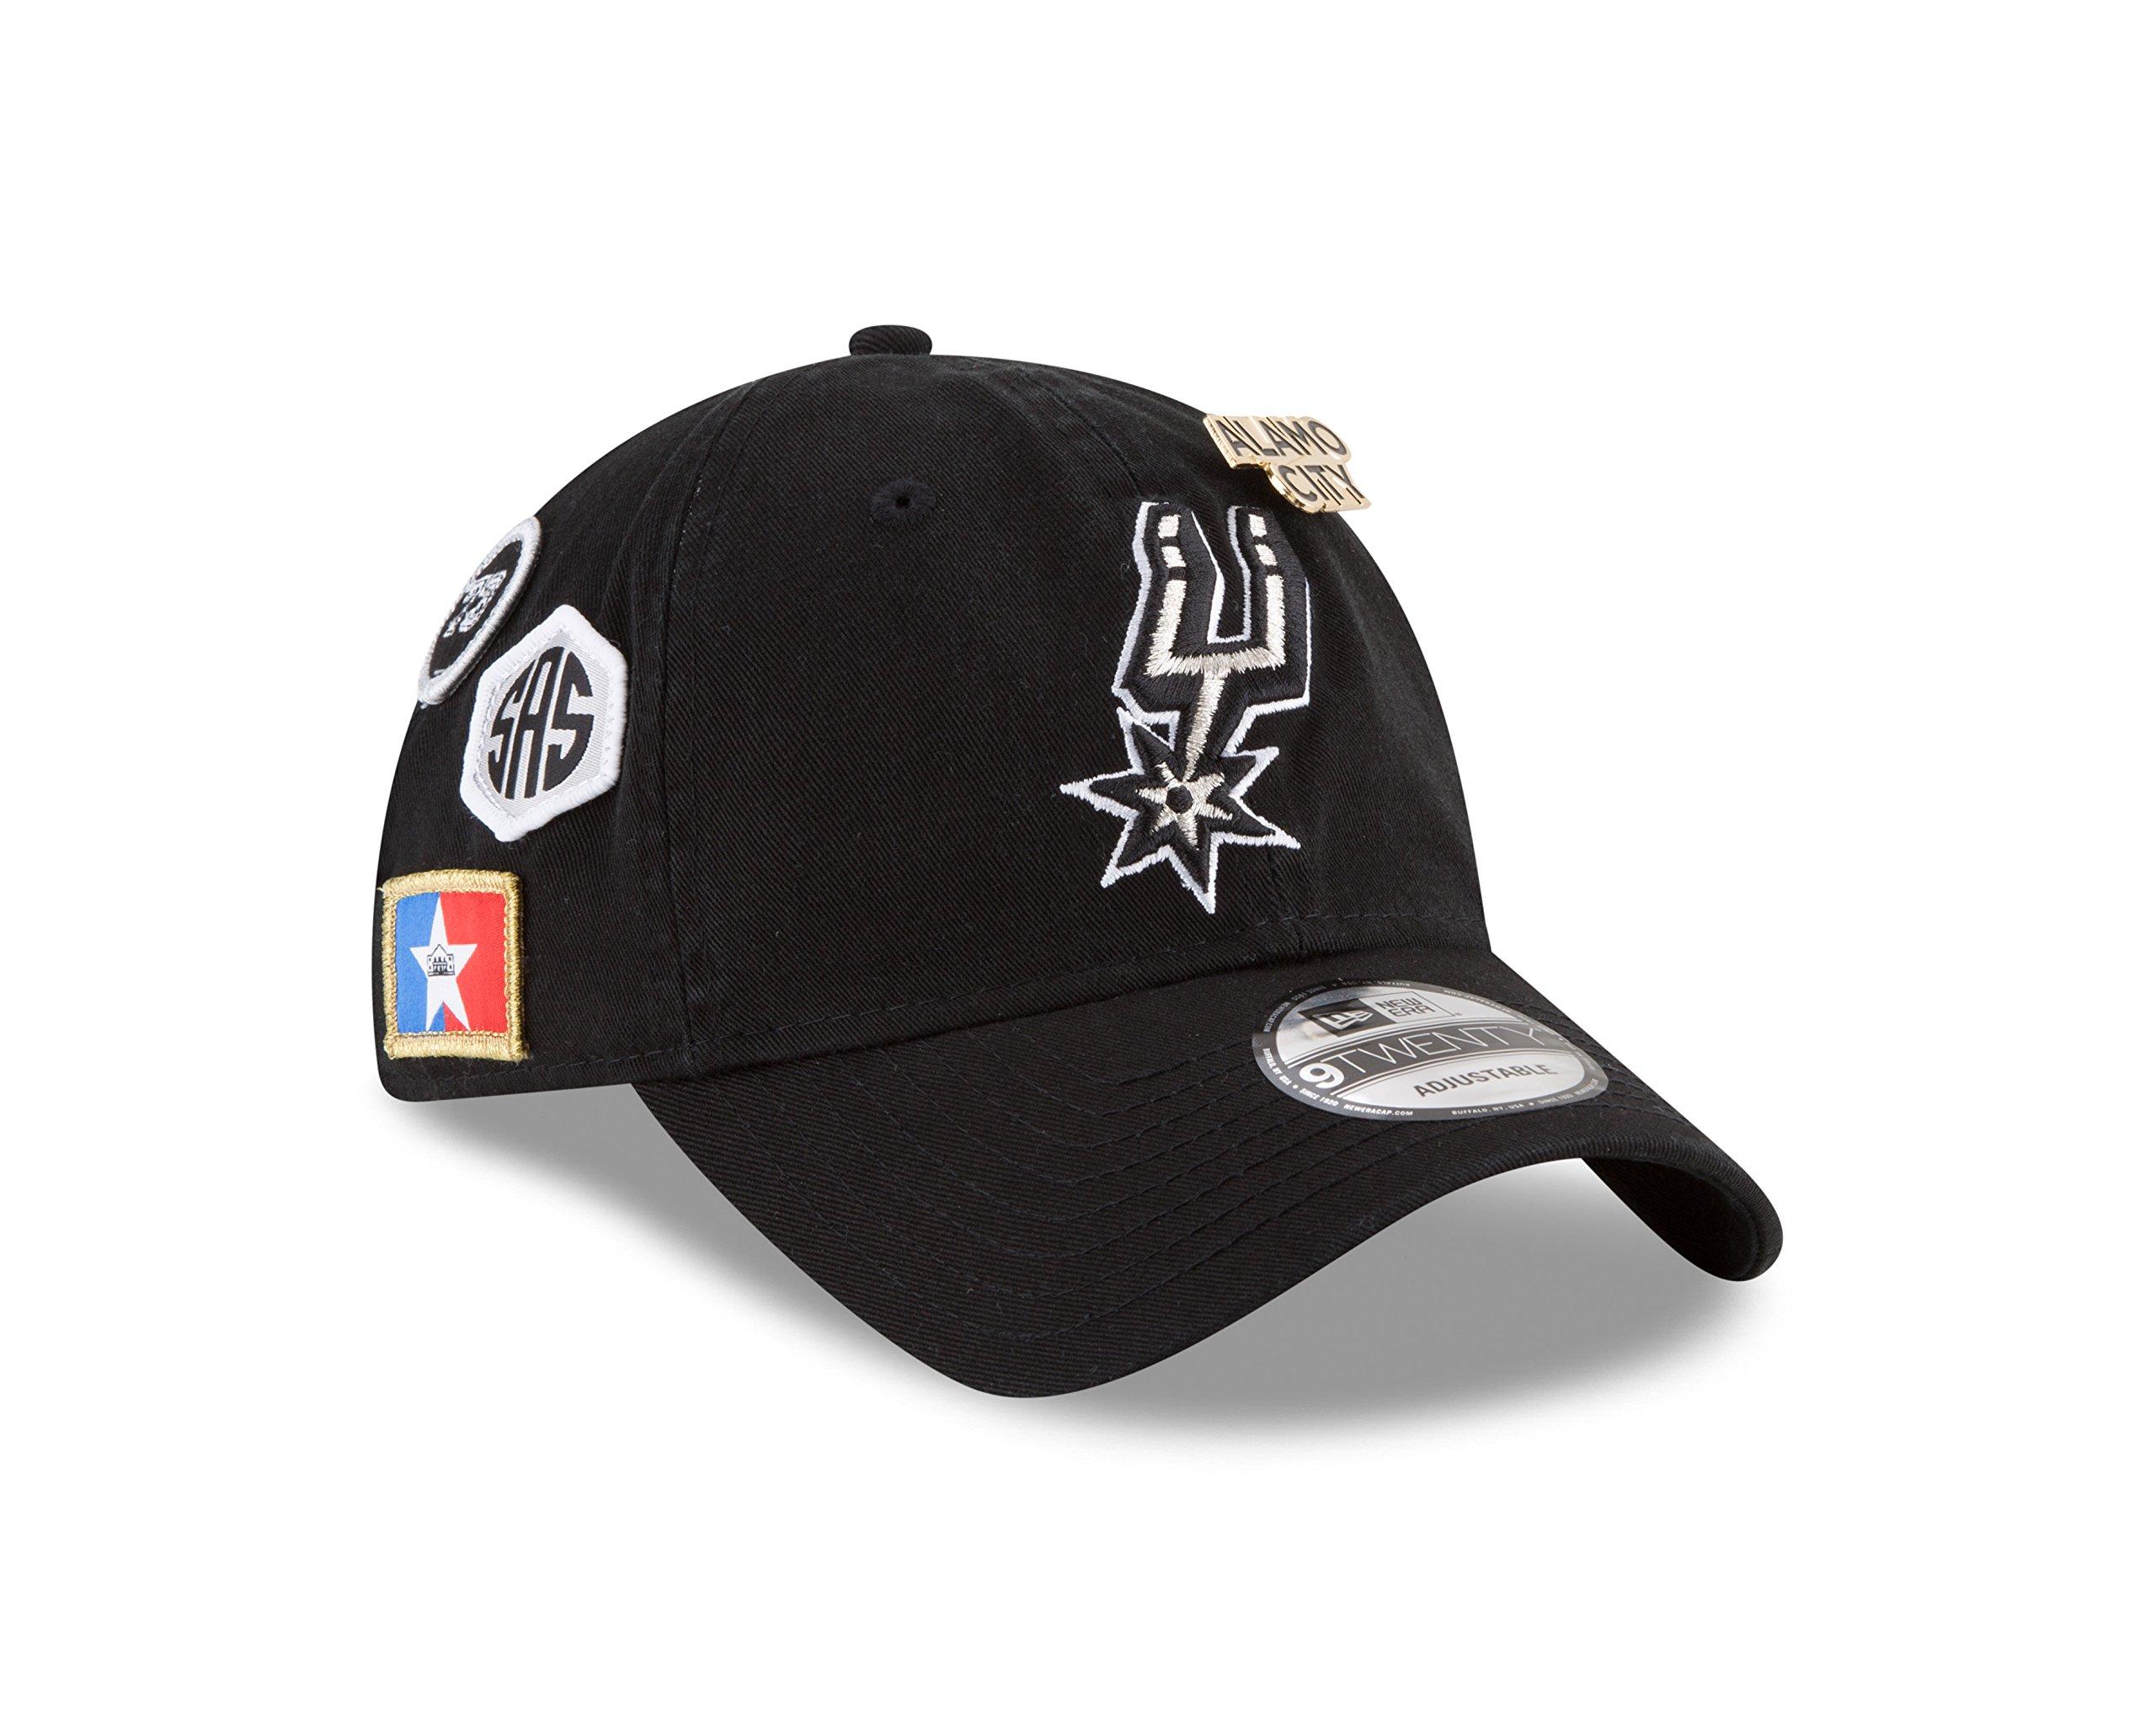 New Era San Antonio Spurs 2018 NBA Draft Cap 9Twenty Adjustable Dad's Hat- Black